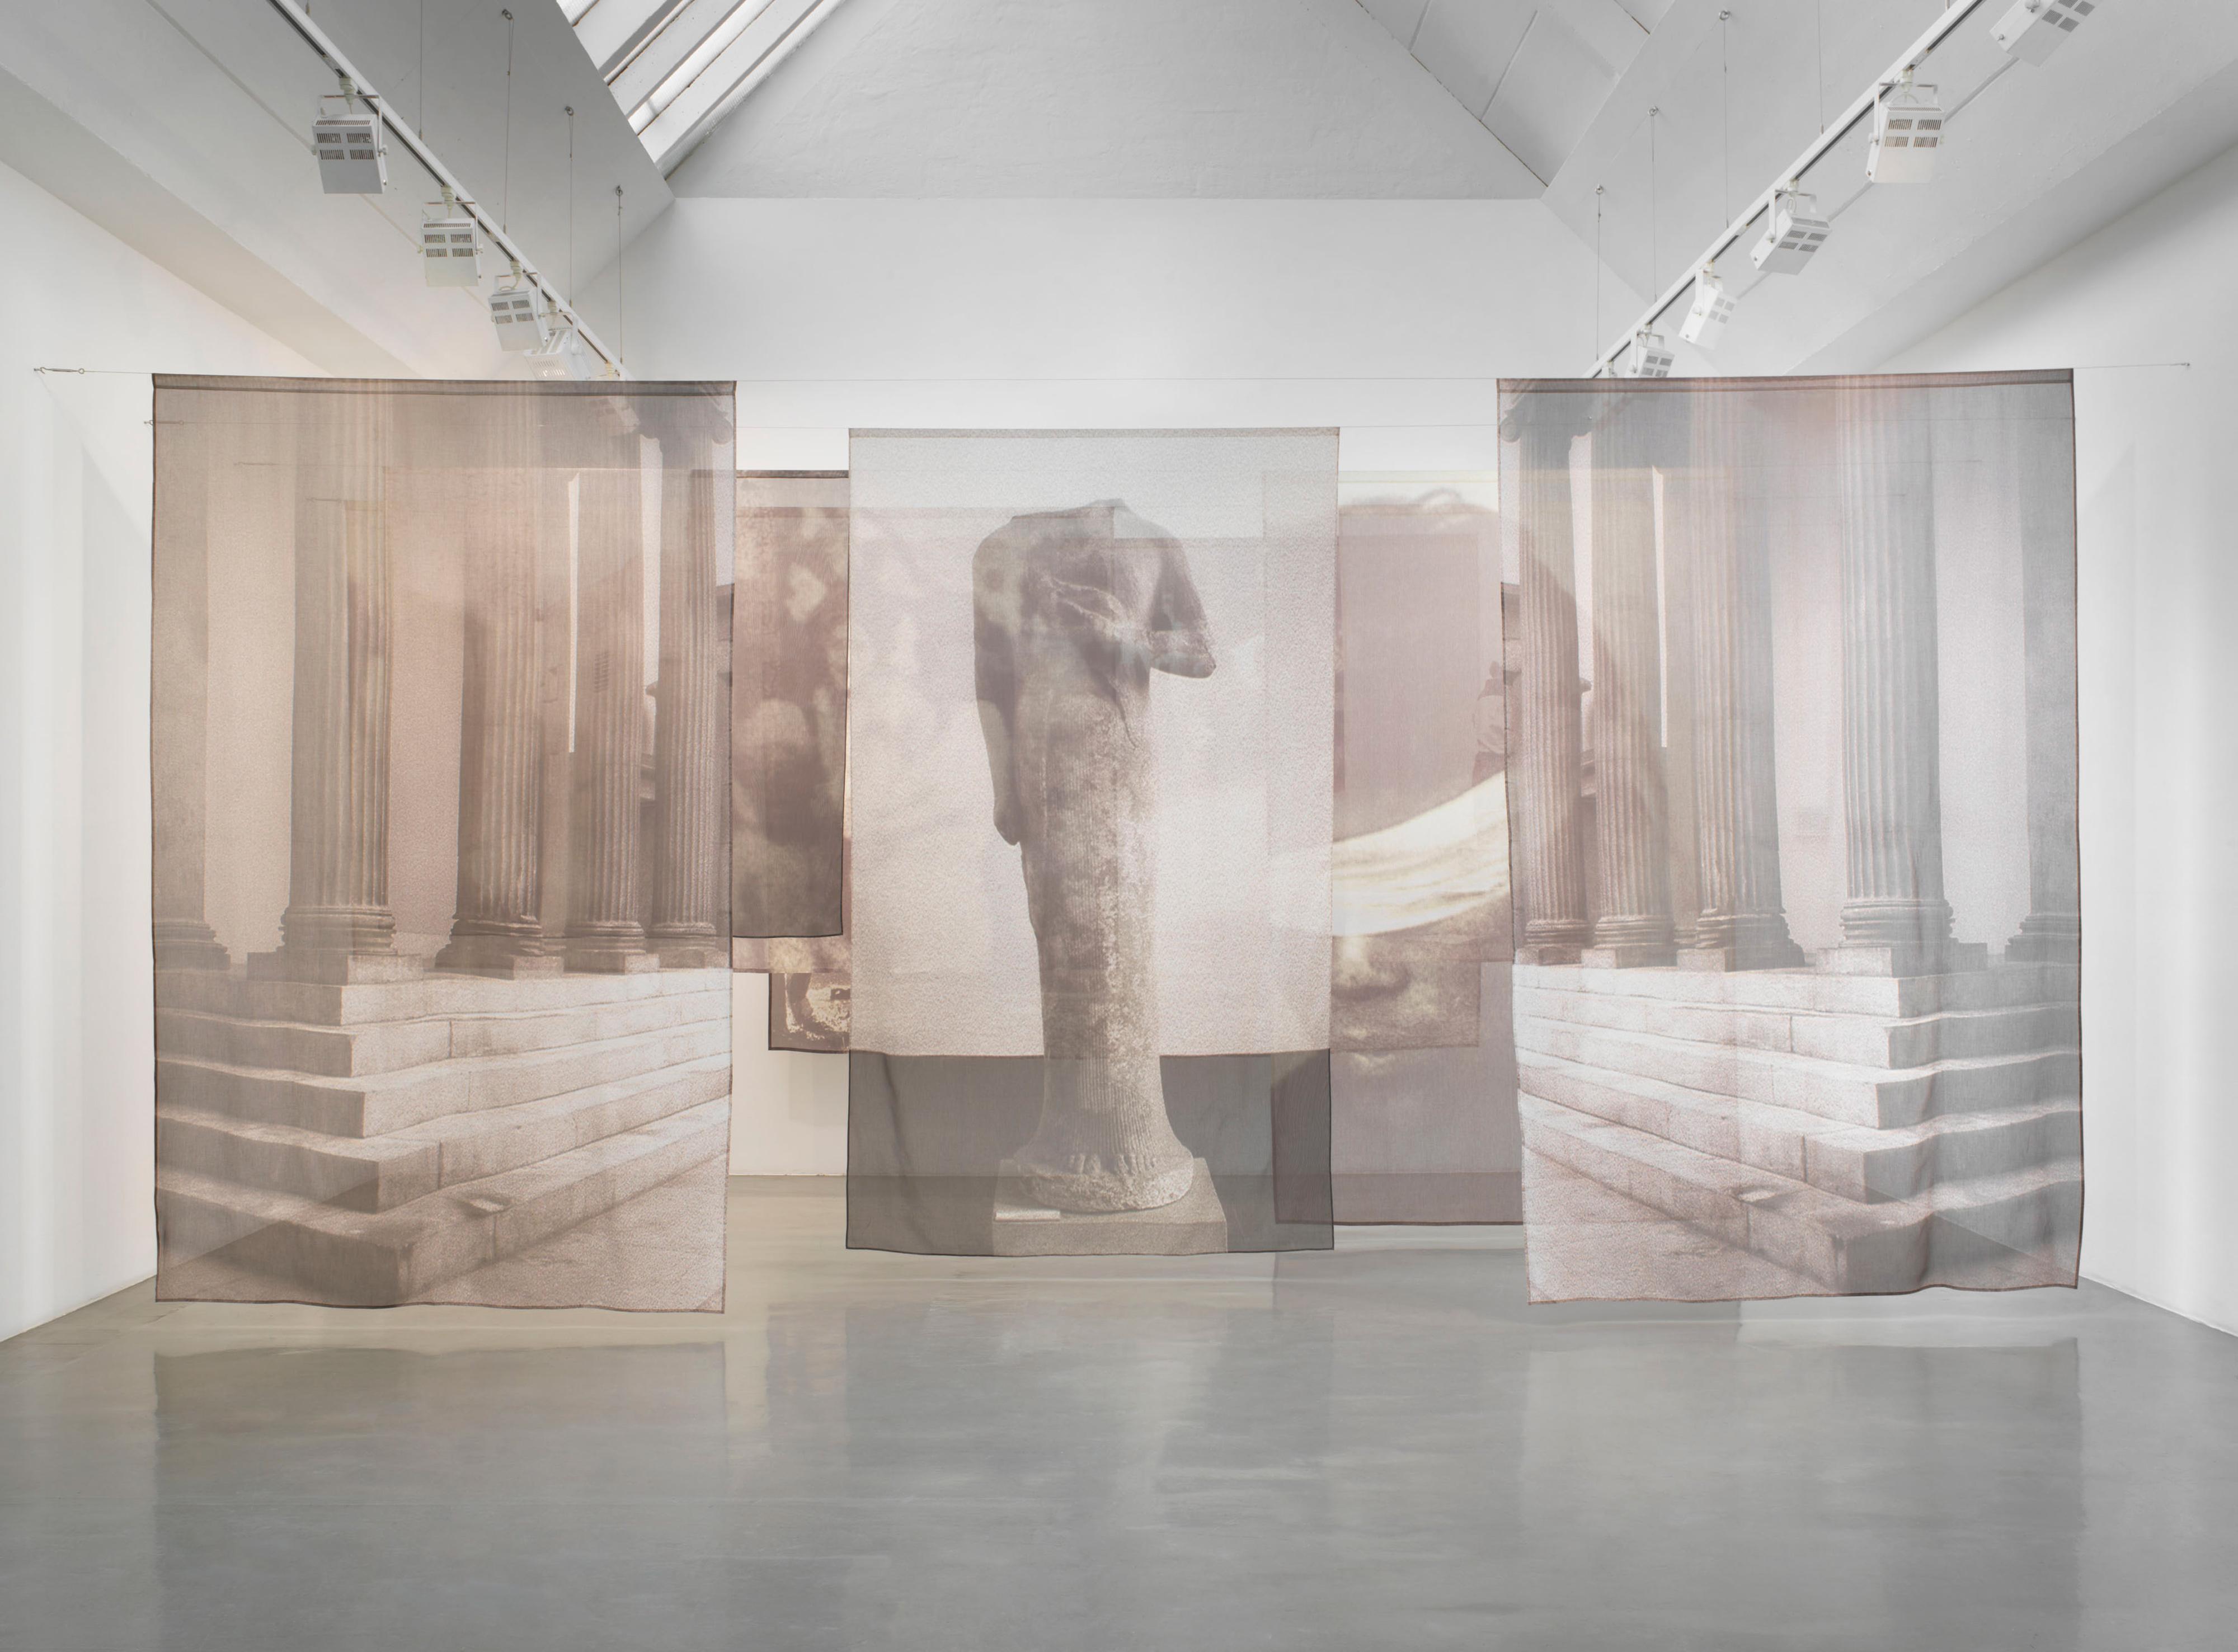 Galerie Barbara Thumm \ Carrie Mae Weems